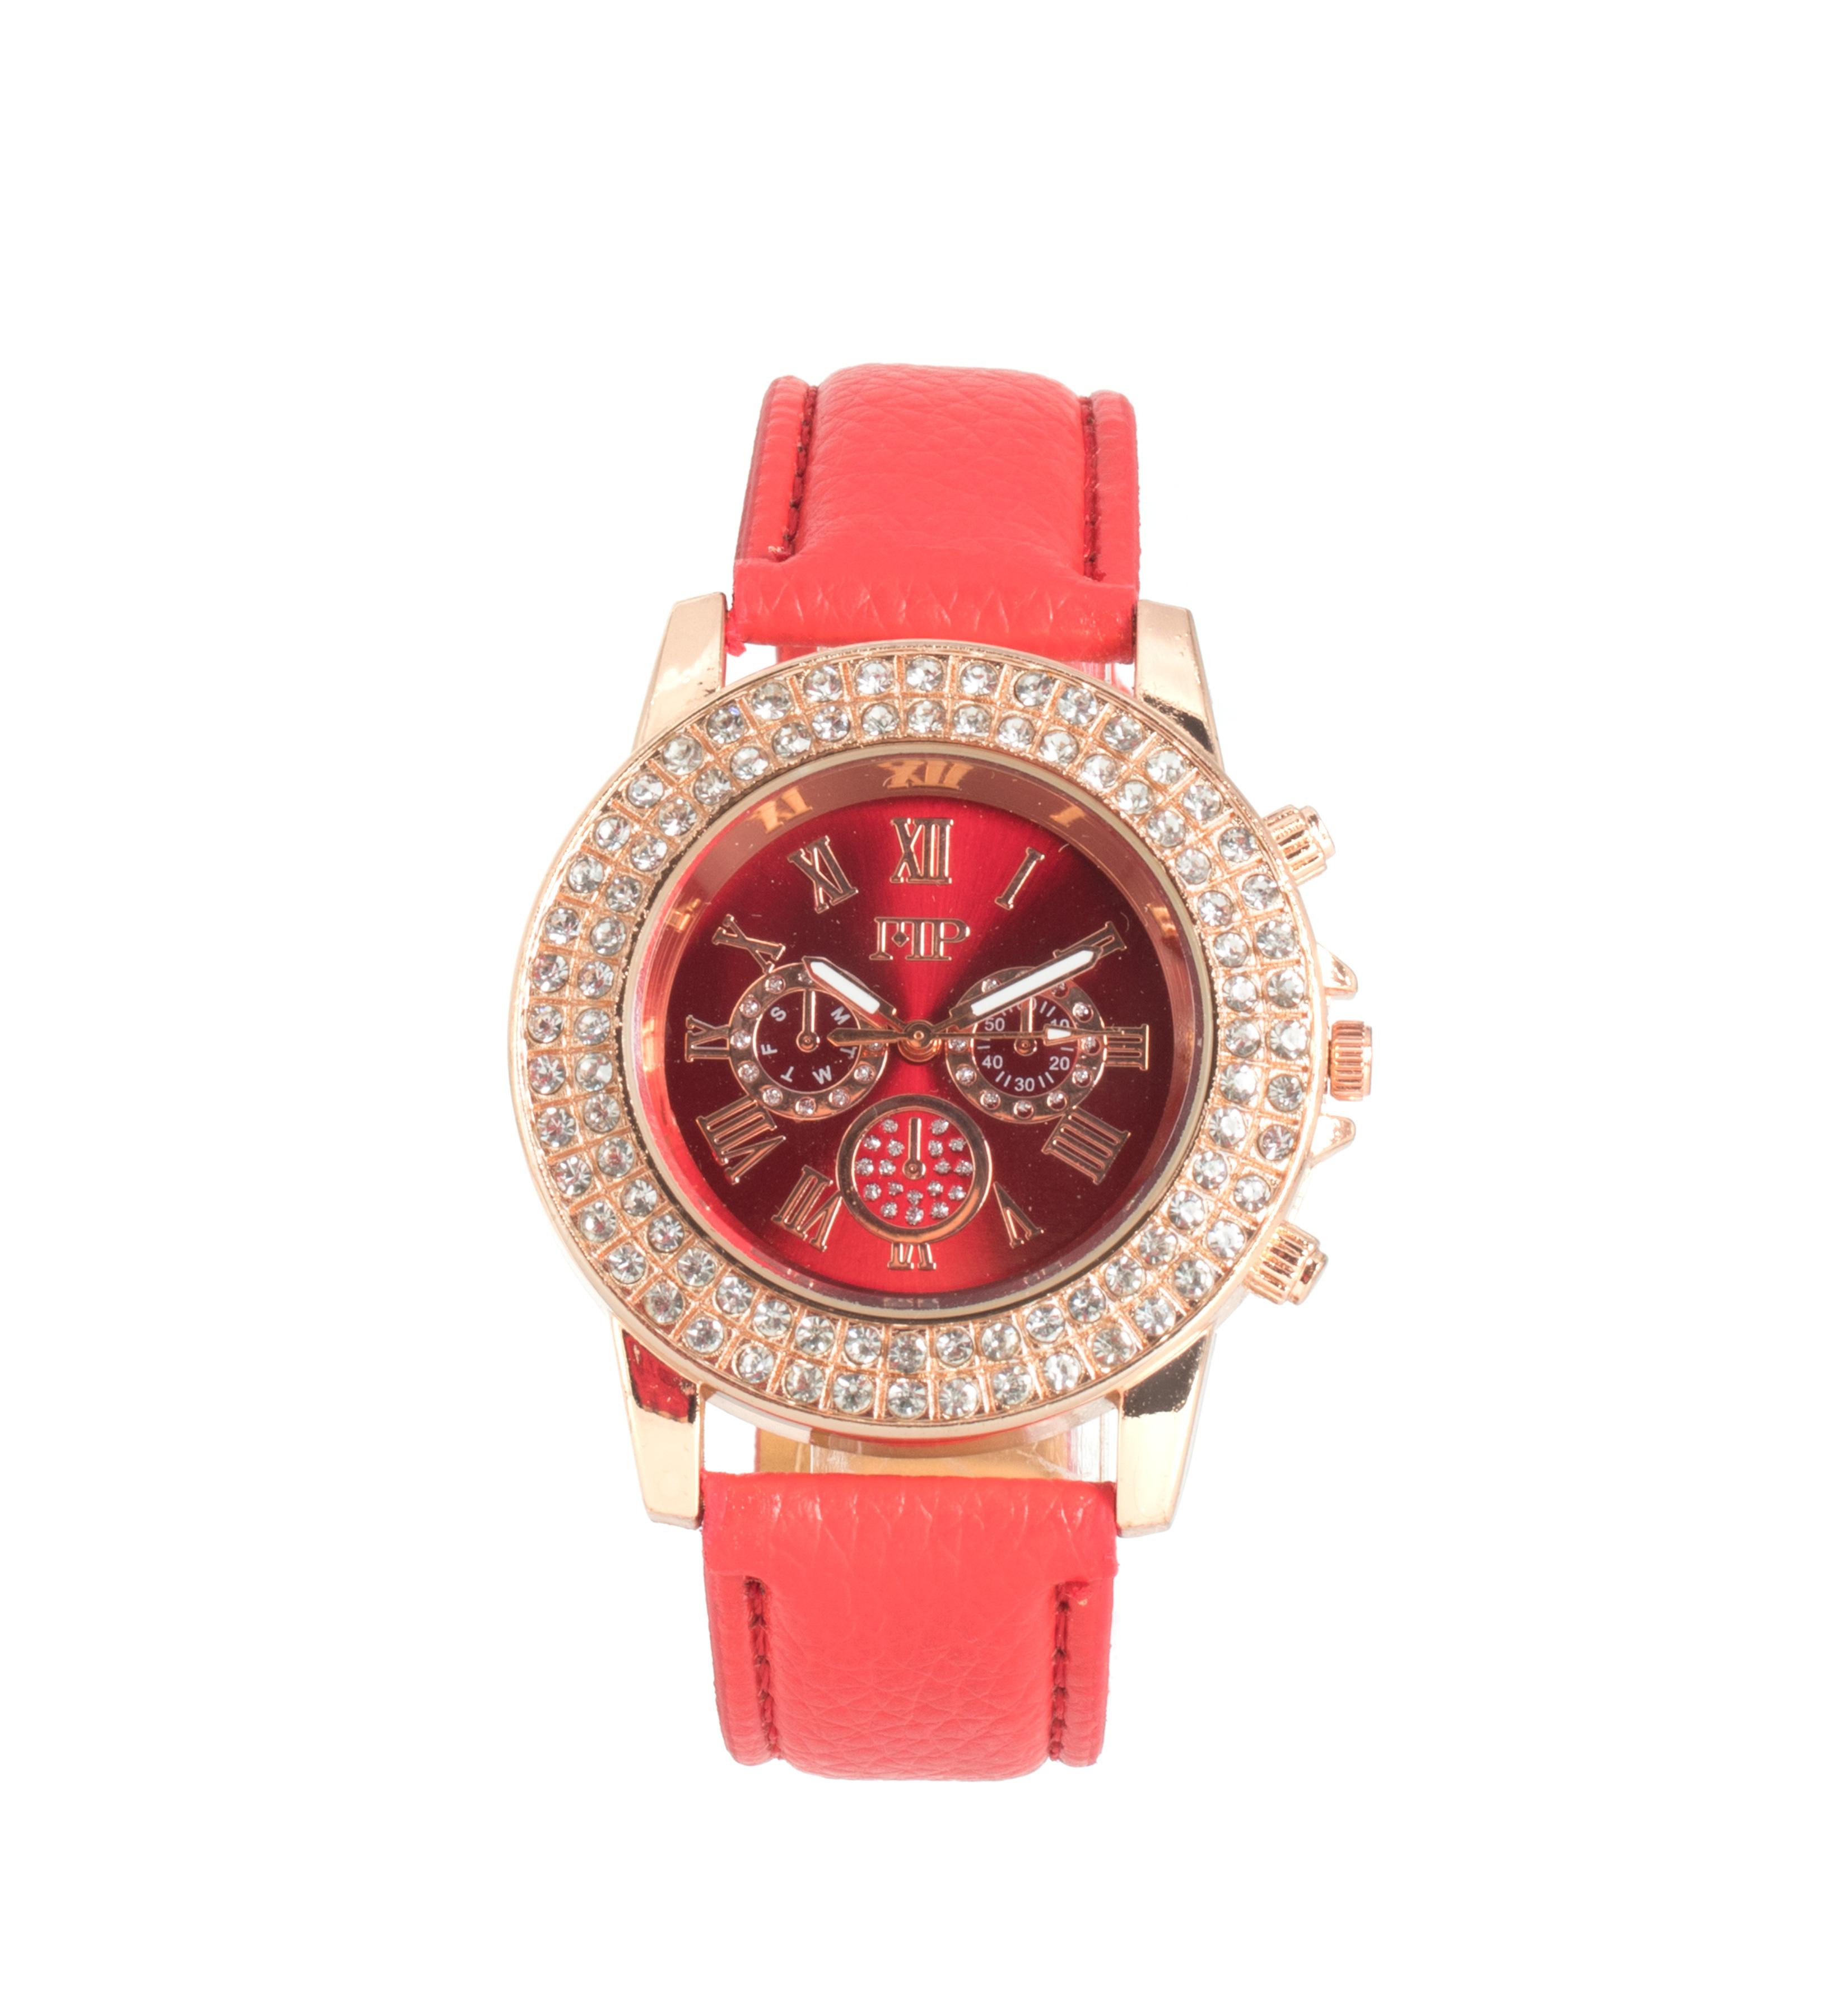 Comprar Marsan Piel Analogue clock Asia red